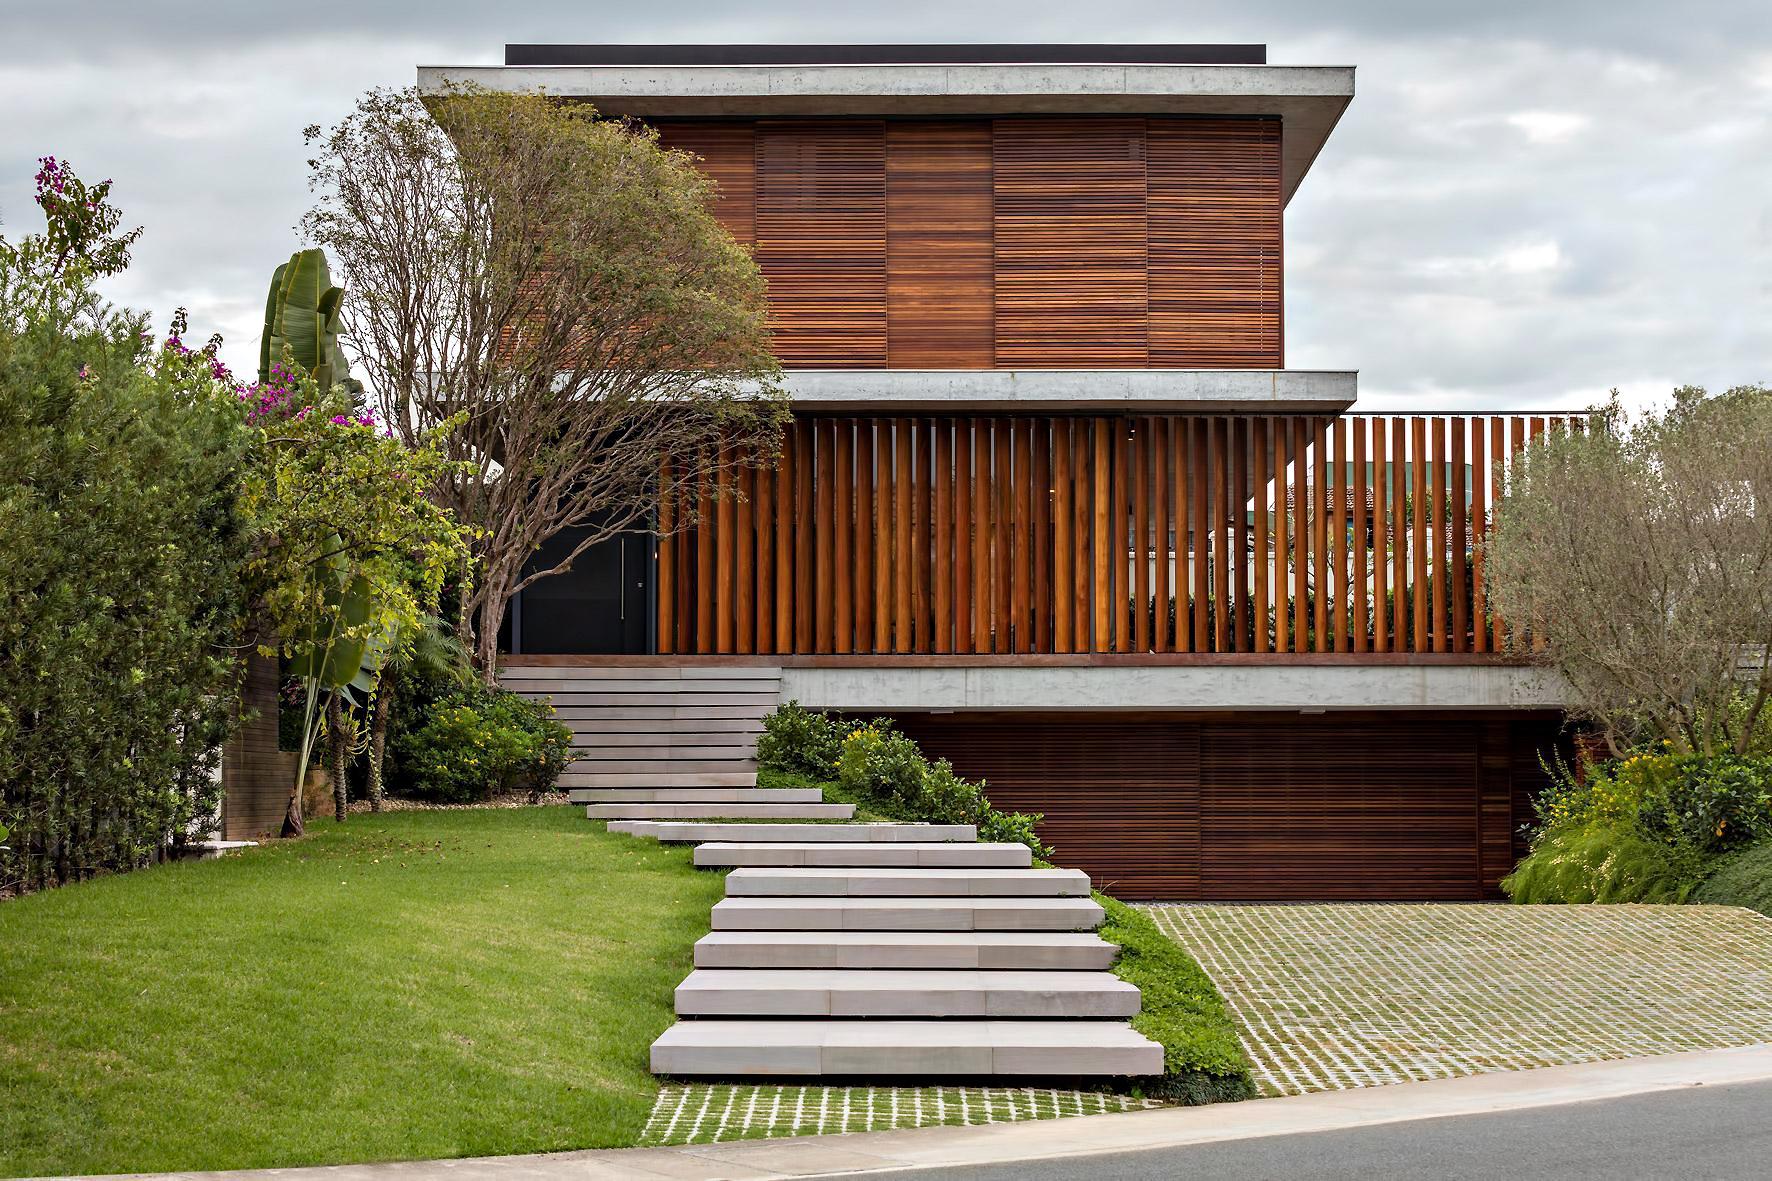 Casa Bravos Luxury Residence – Itajaí, Santa Catarina, Brazil